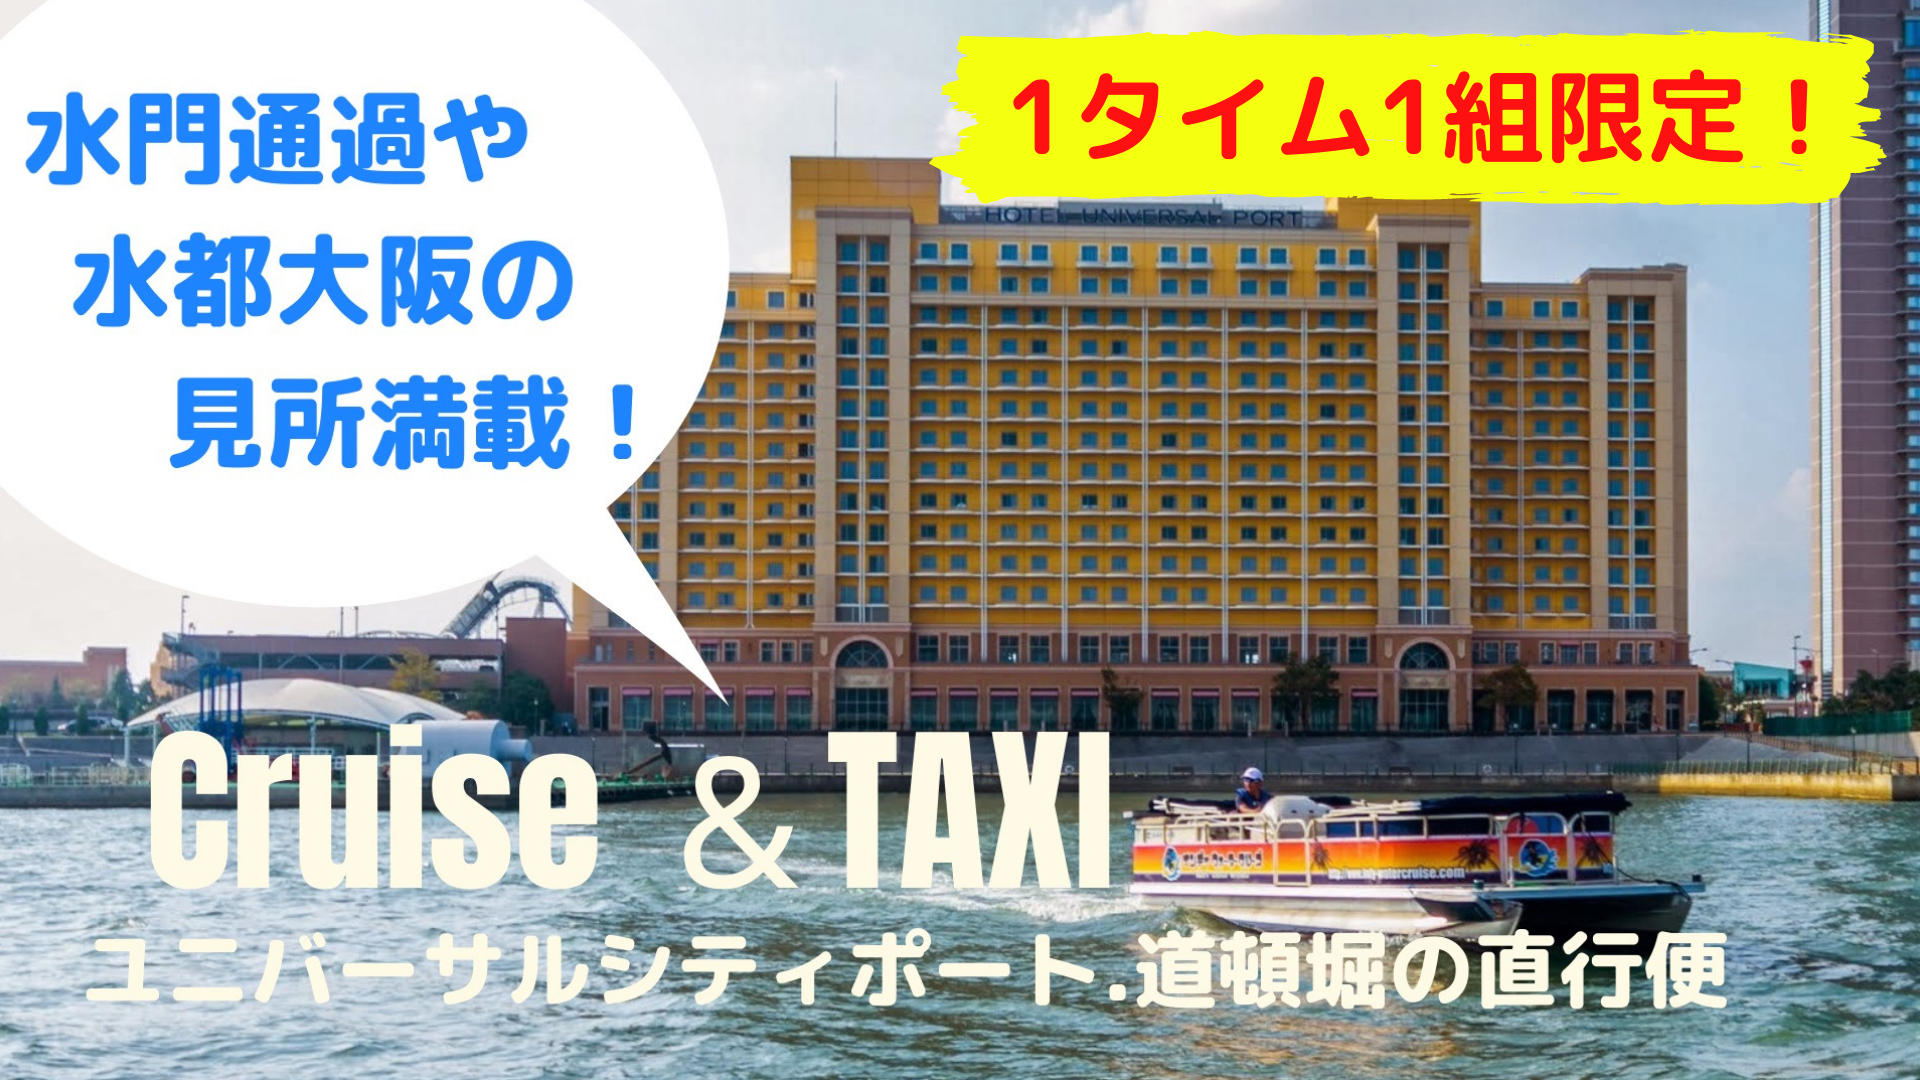 ☆ USJ ← → 道頓堀 クルーズ&TAXI!(1タイム1組限定)